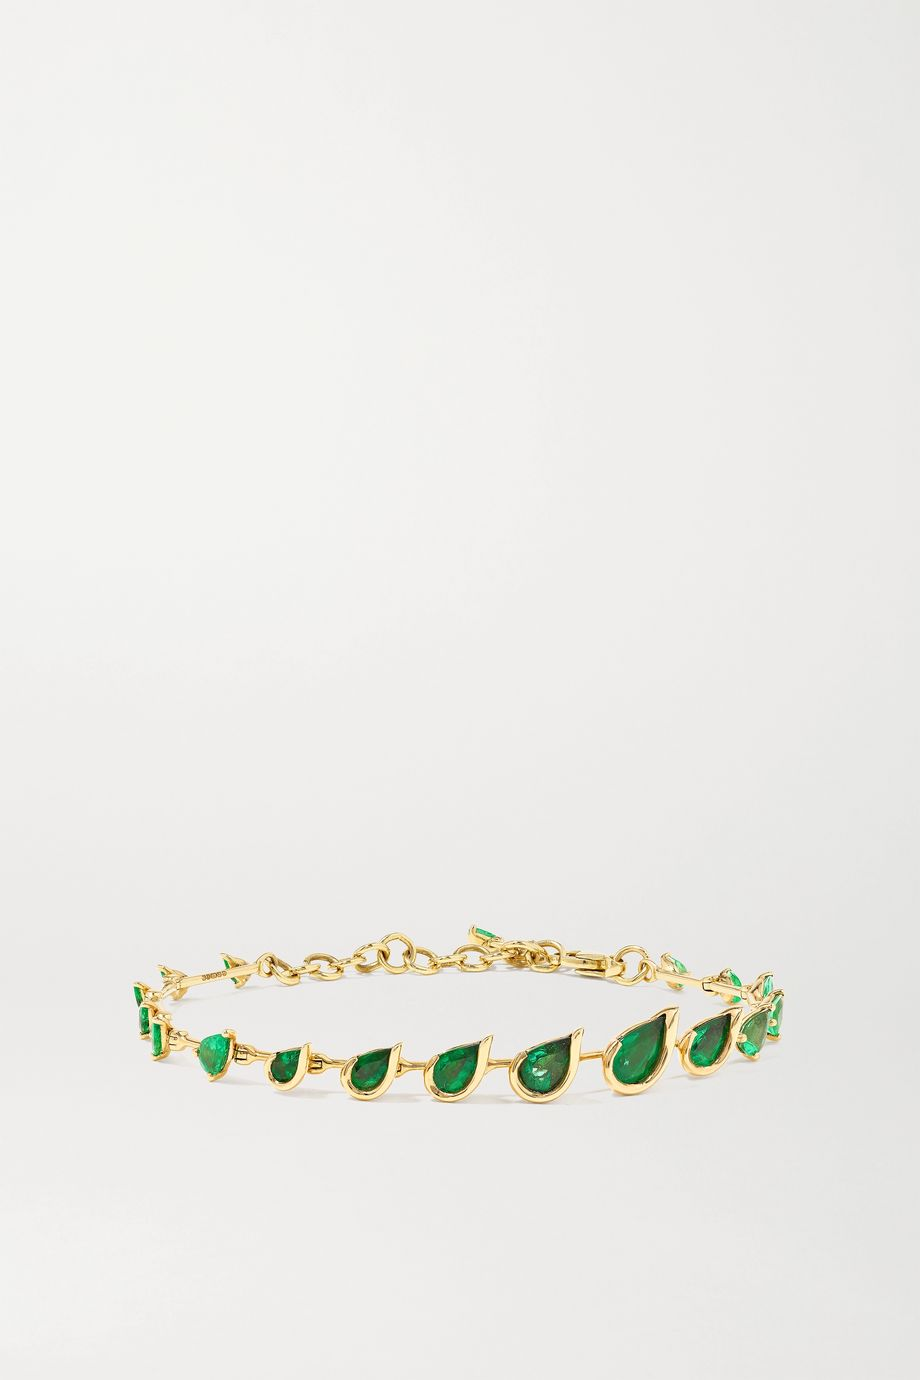 Fernando Jorge Flicker 18-karat gold emerald bracelet